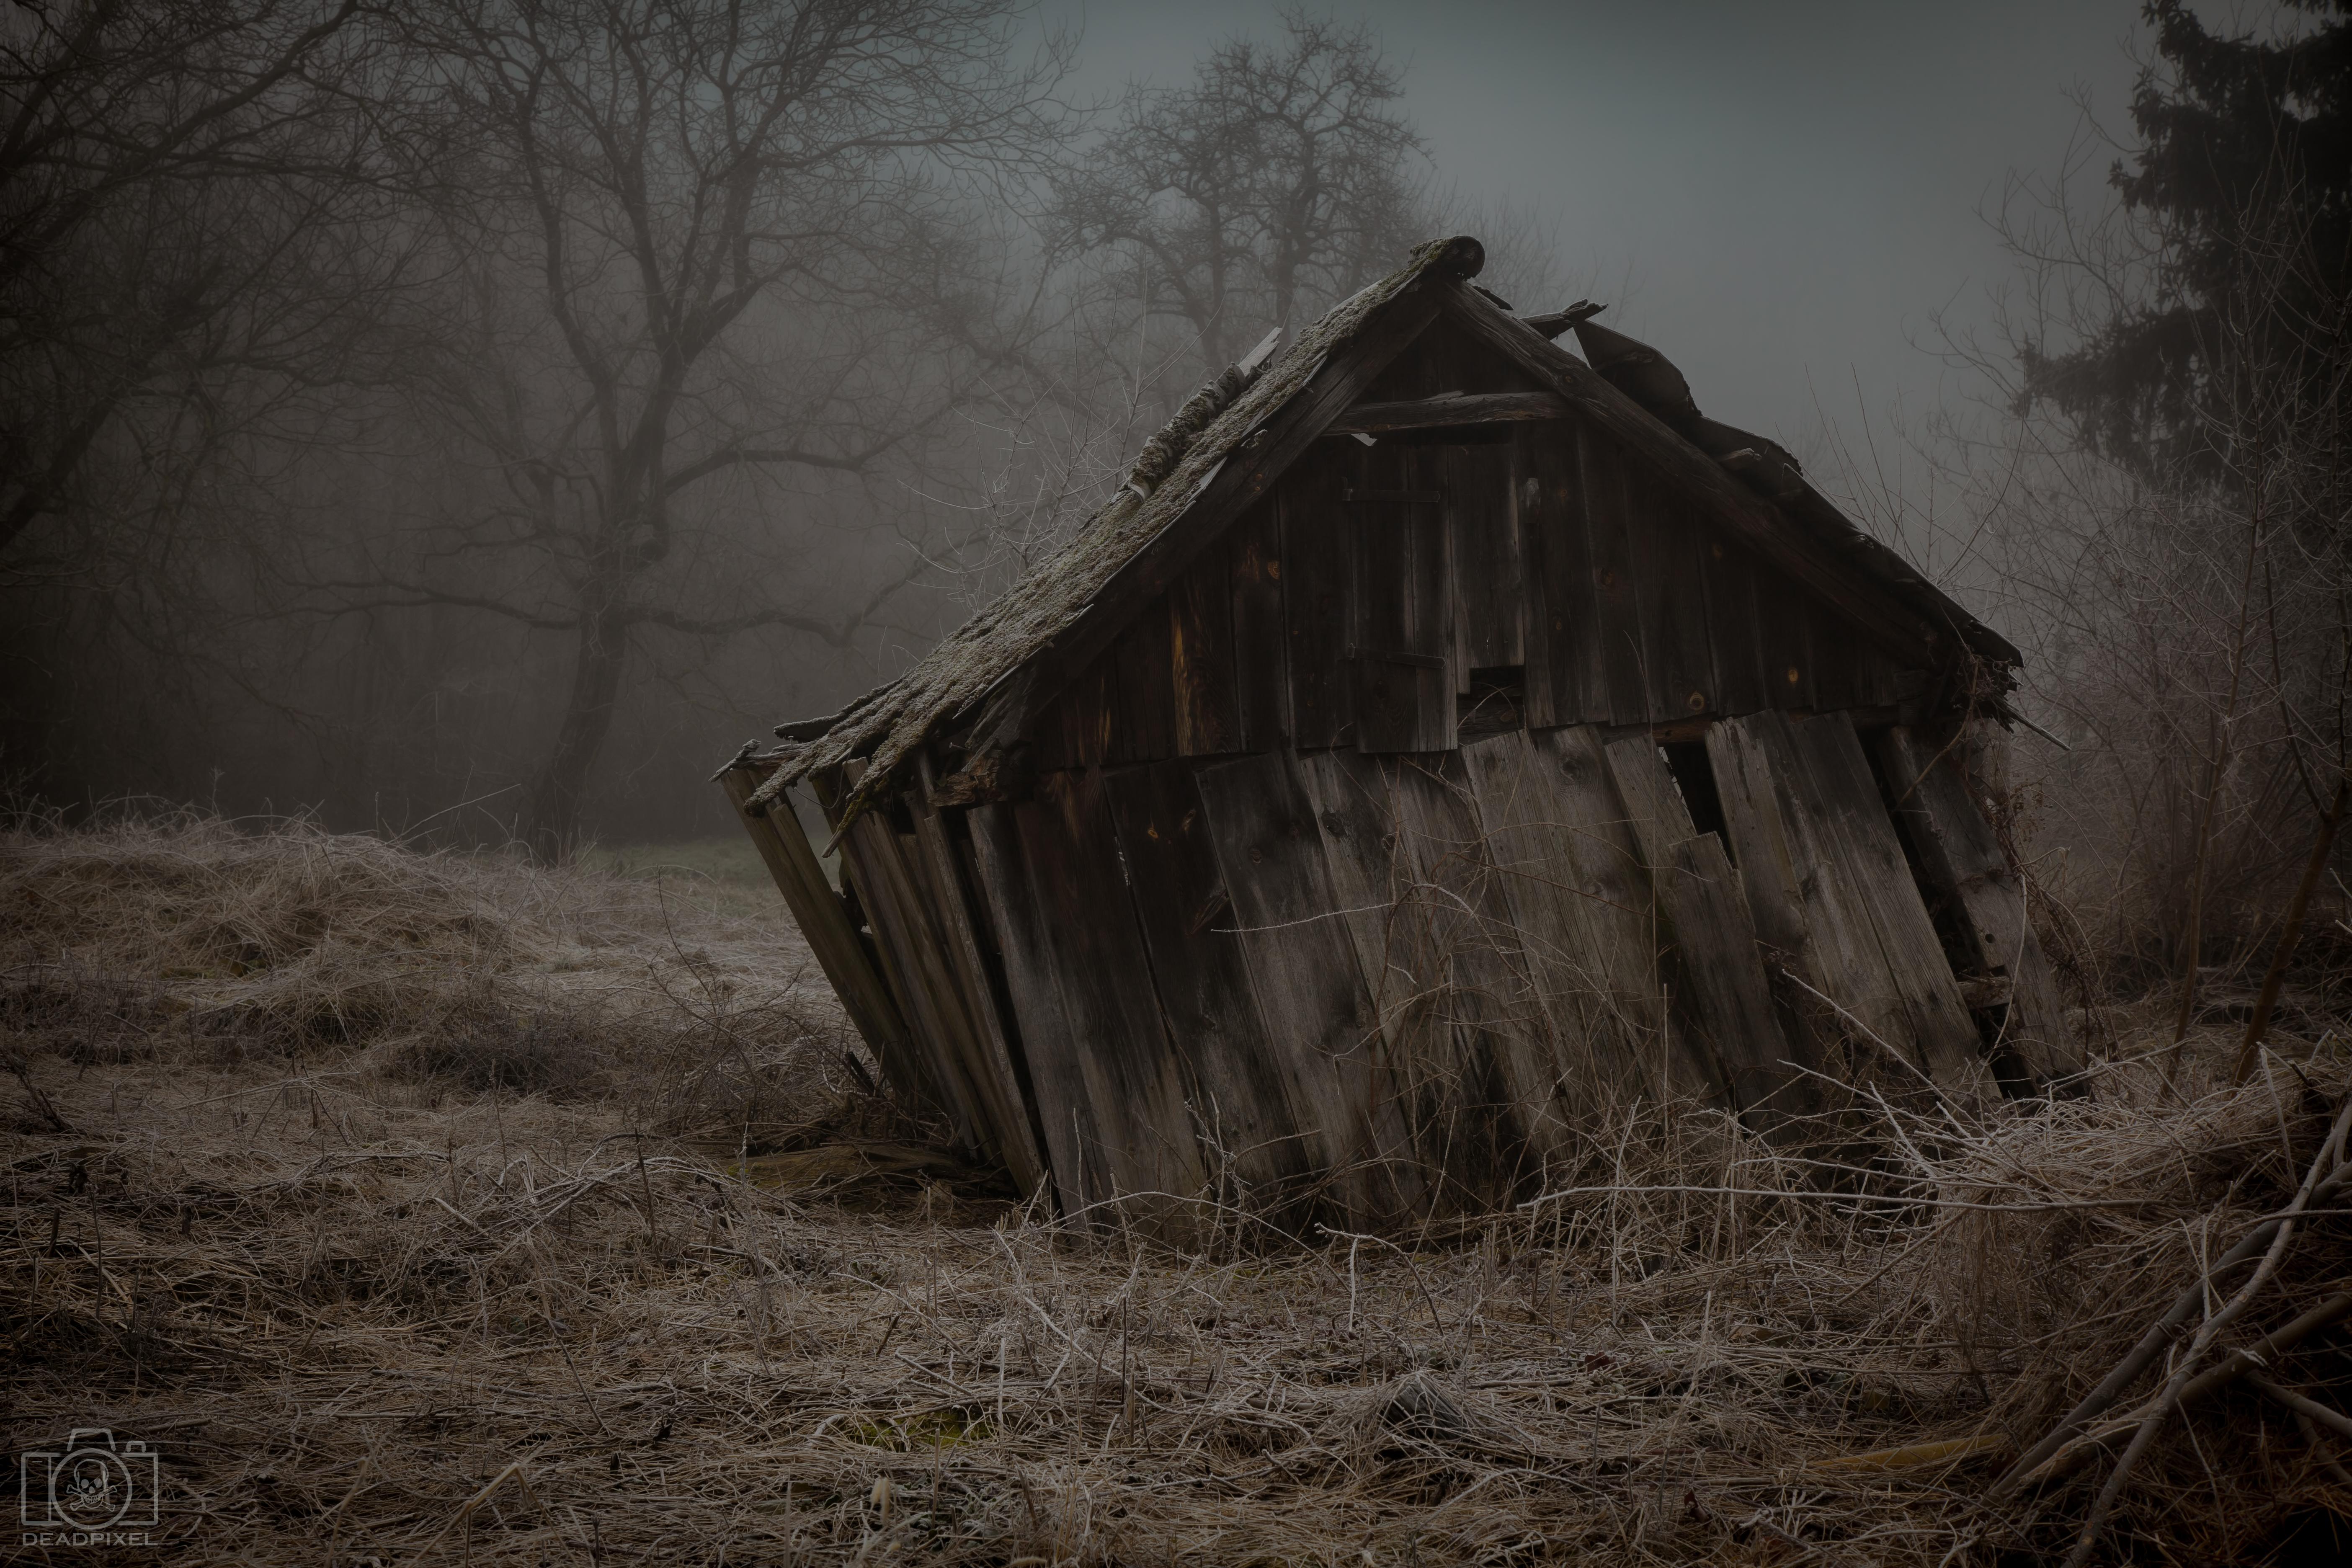 I Like To Photograph Abandoned Places